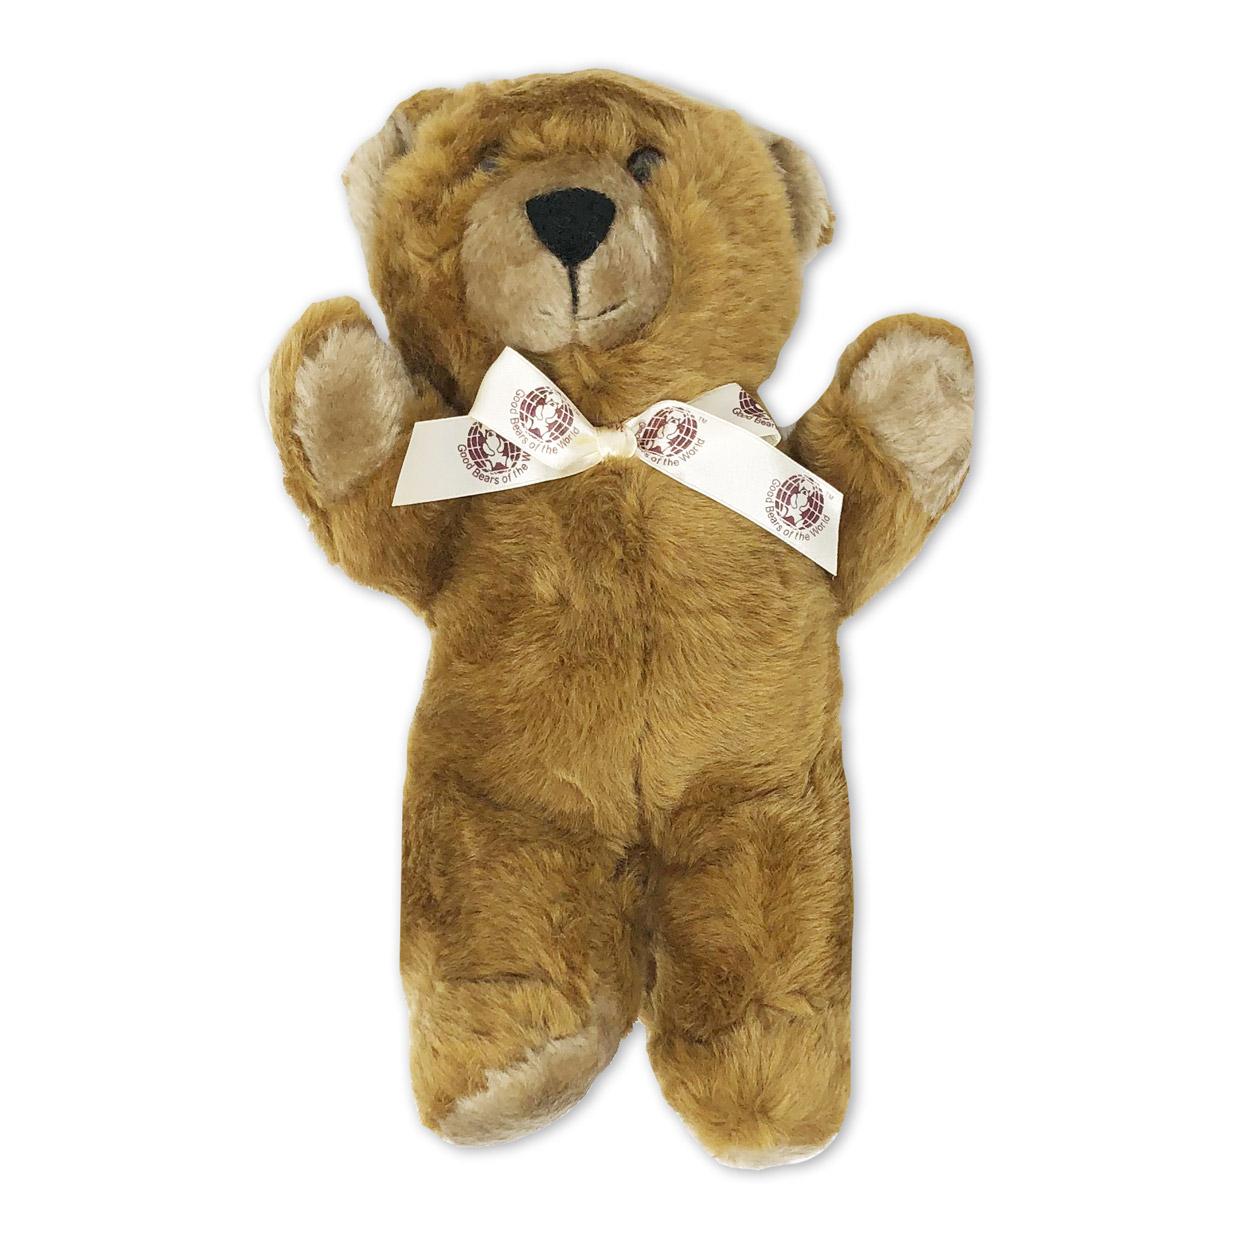 Notfall-Teddybär, 28 cm groß